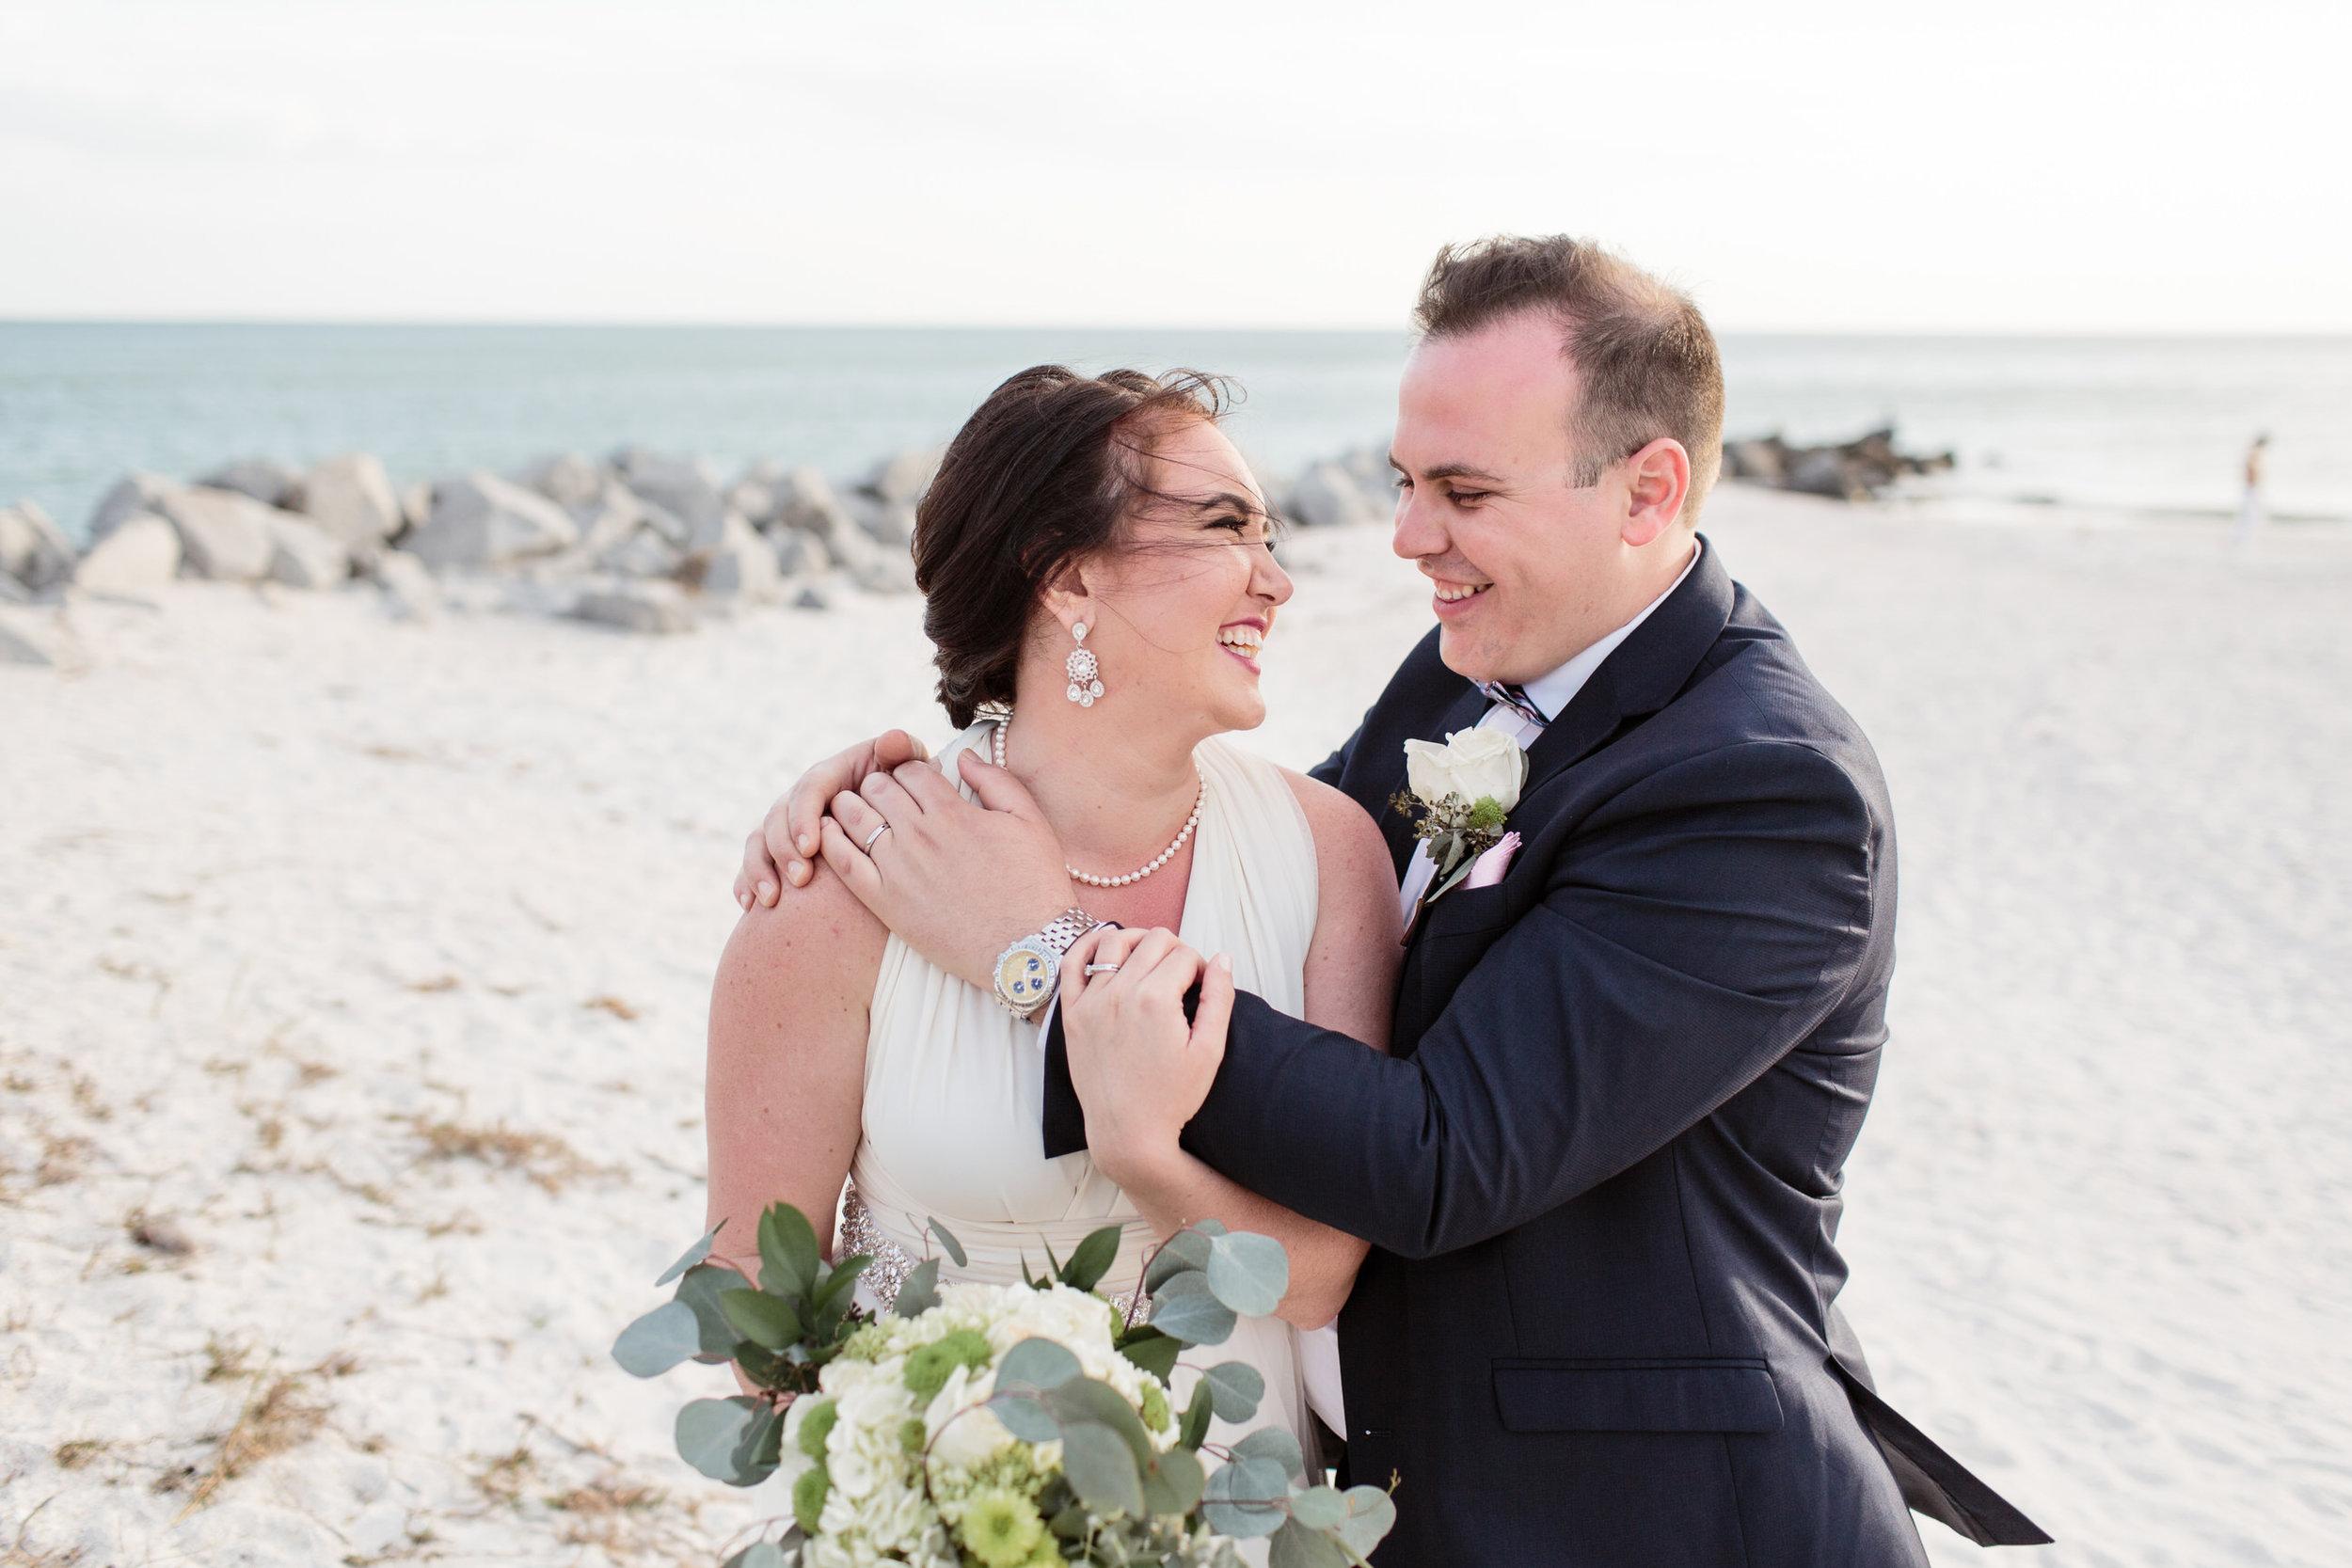 Beltran_Treasure_Island_Elopement_Tampa_Wedding_106-1.jpg